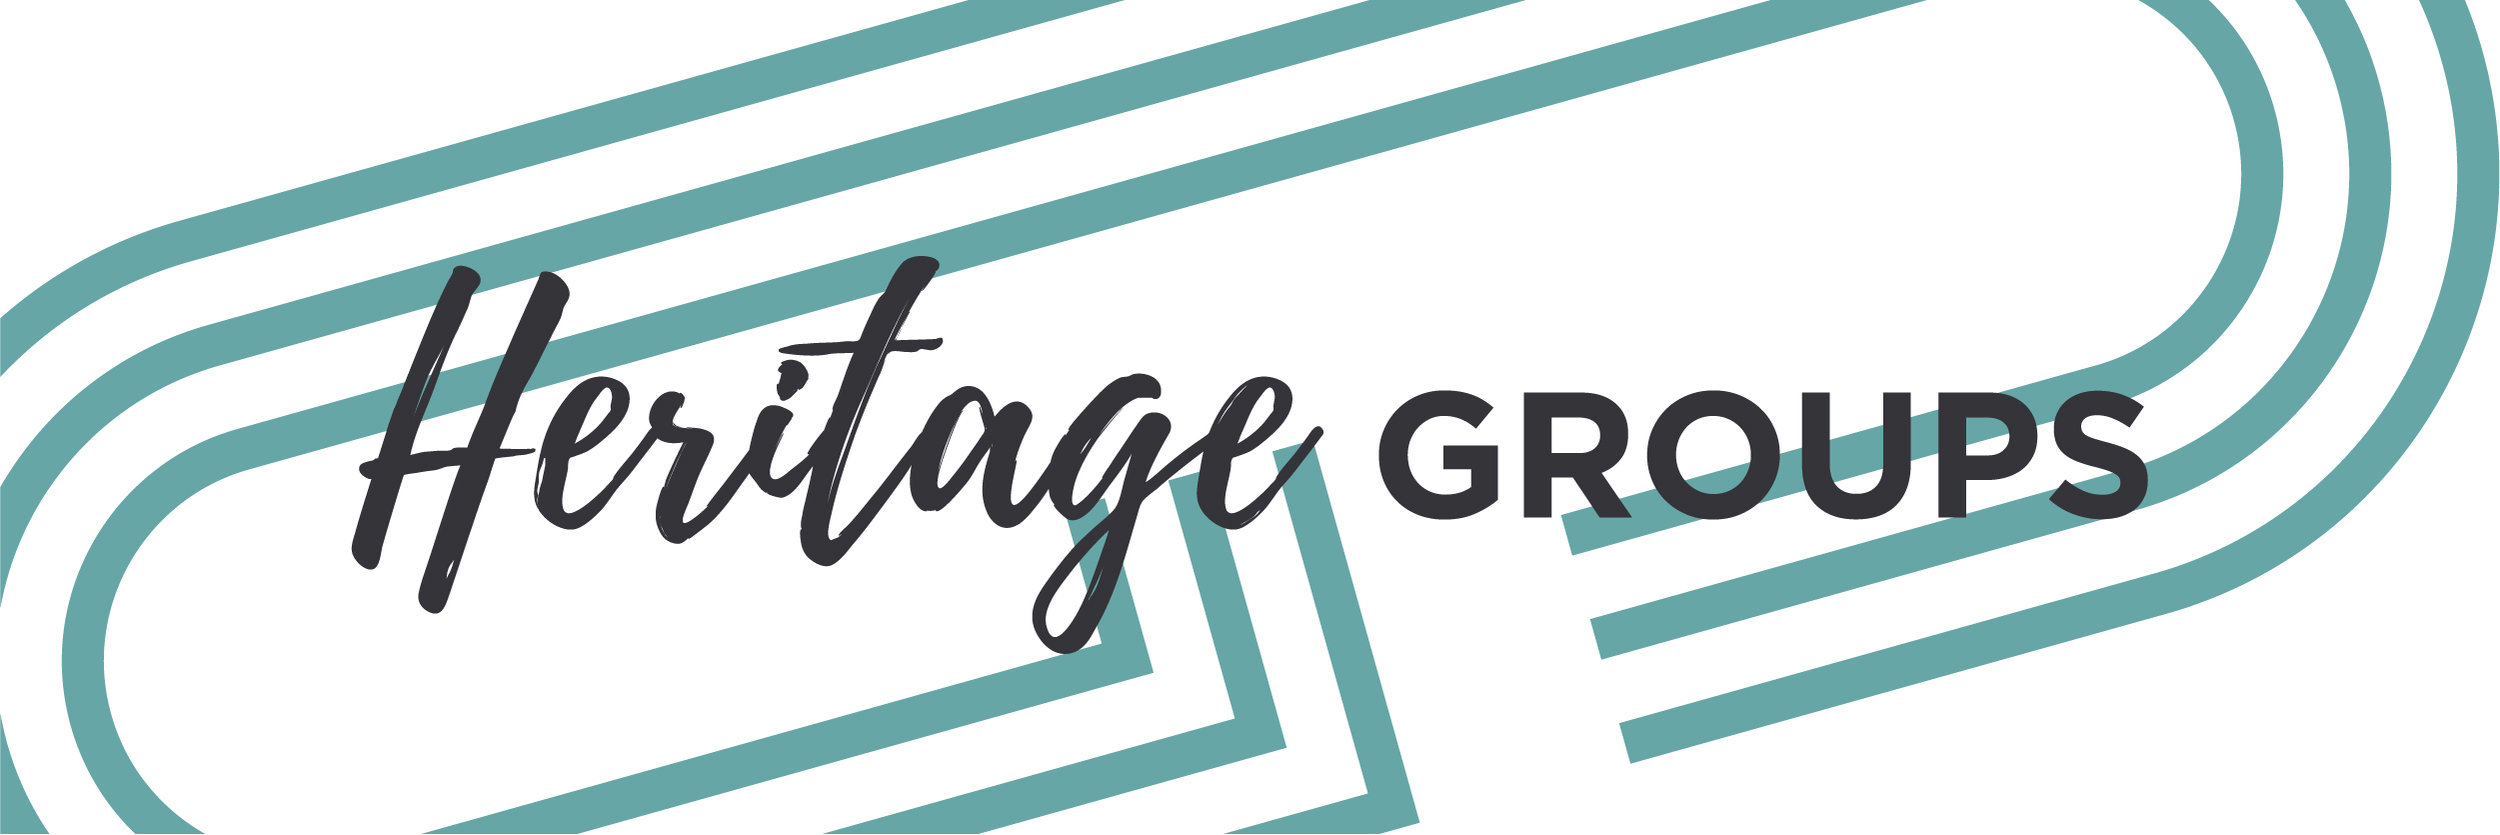 Heritage Groups_Handout-11.jpg